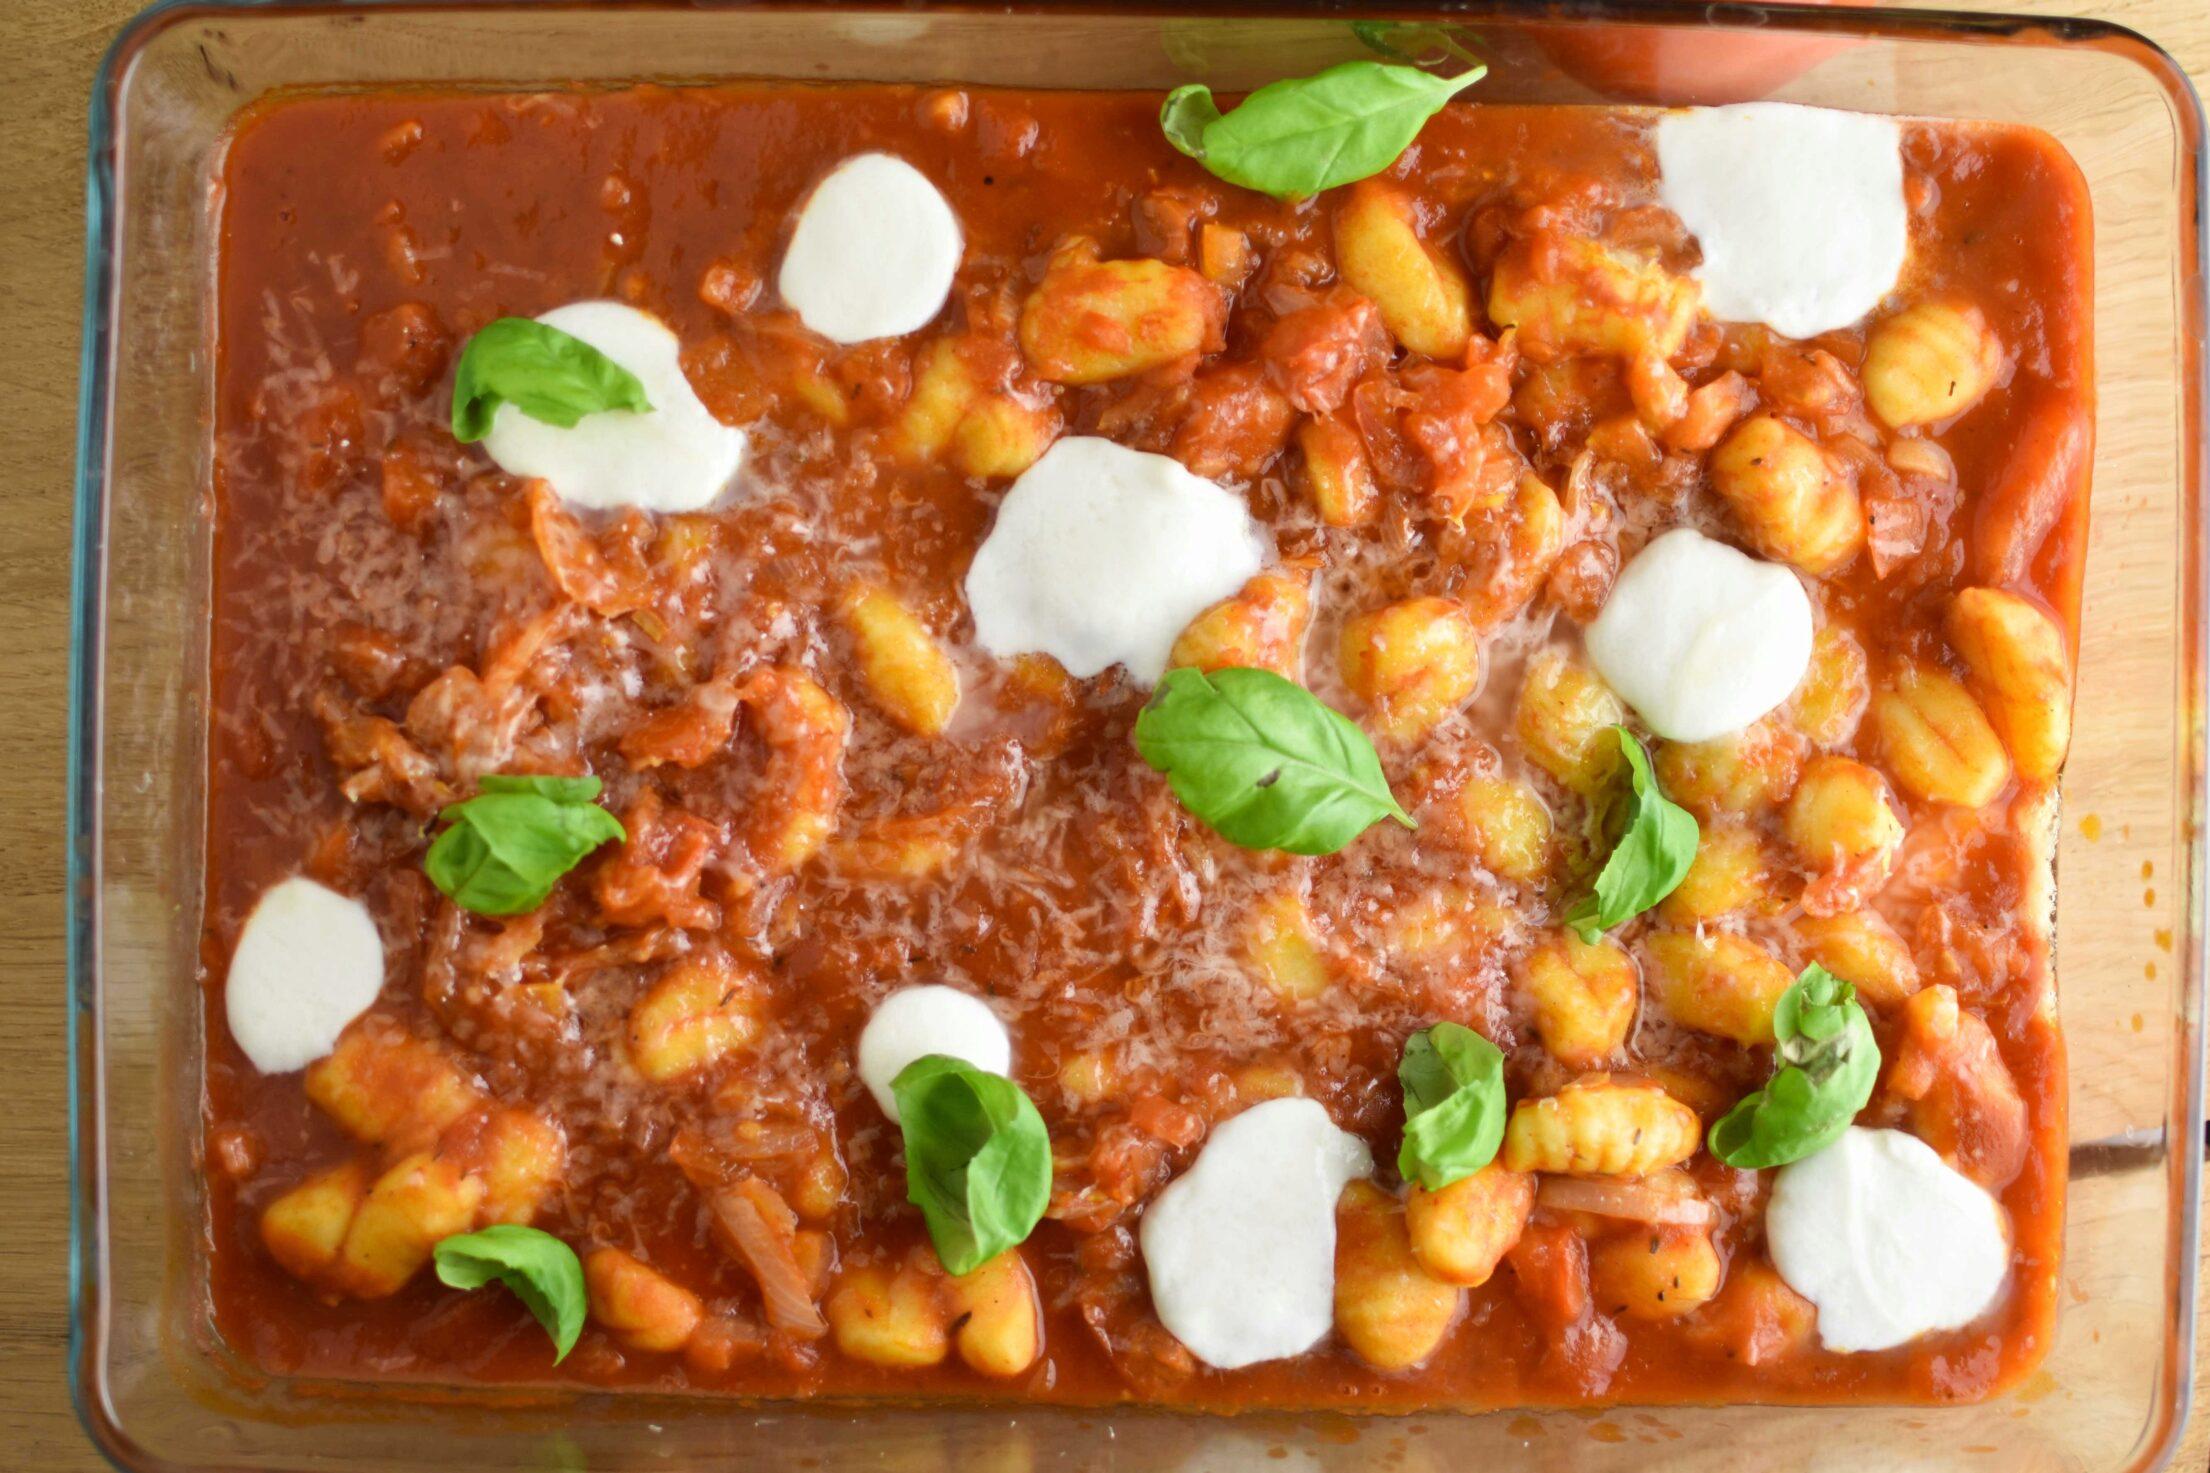 Gnocchi recept uit de oven